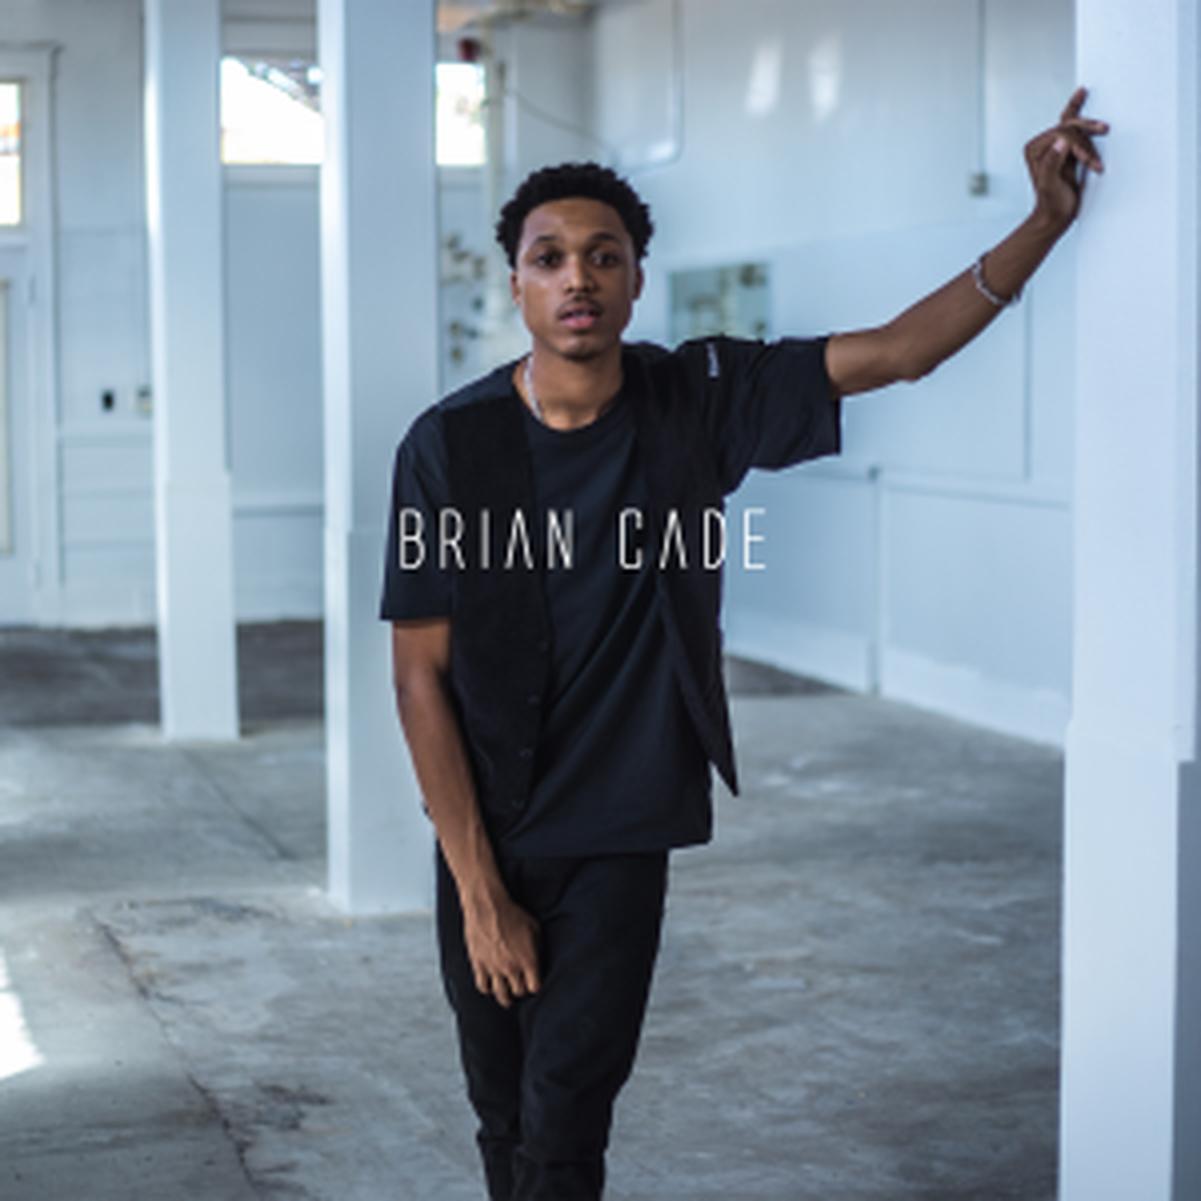 Brian Cade